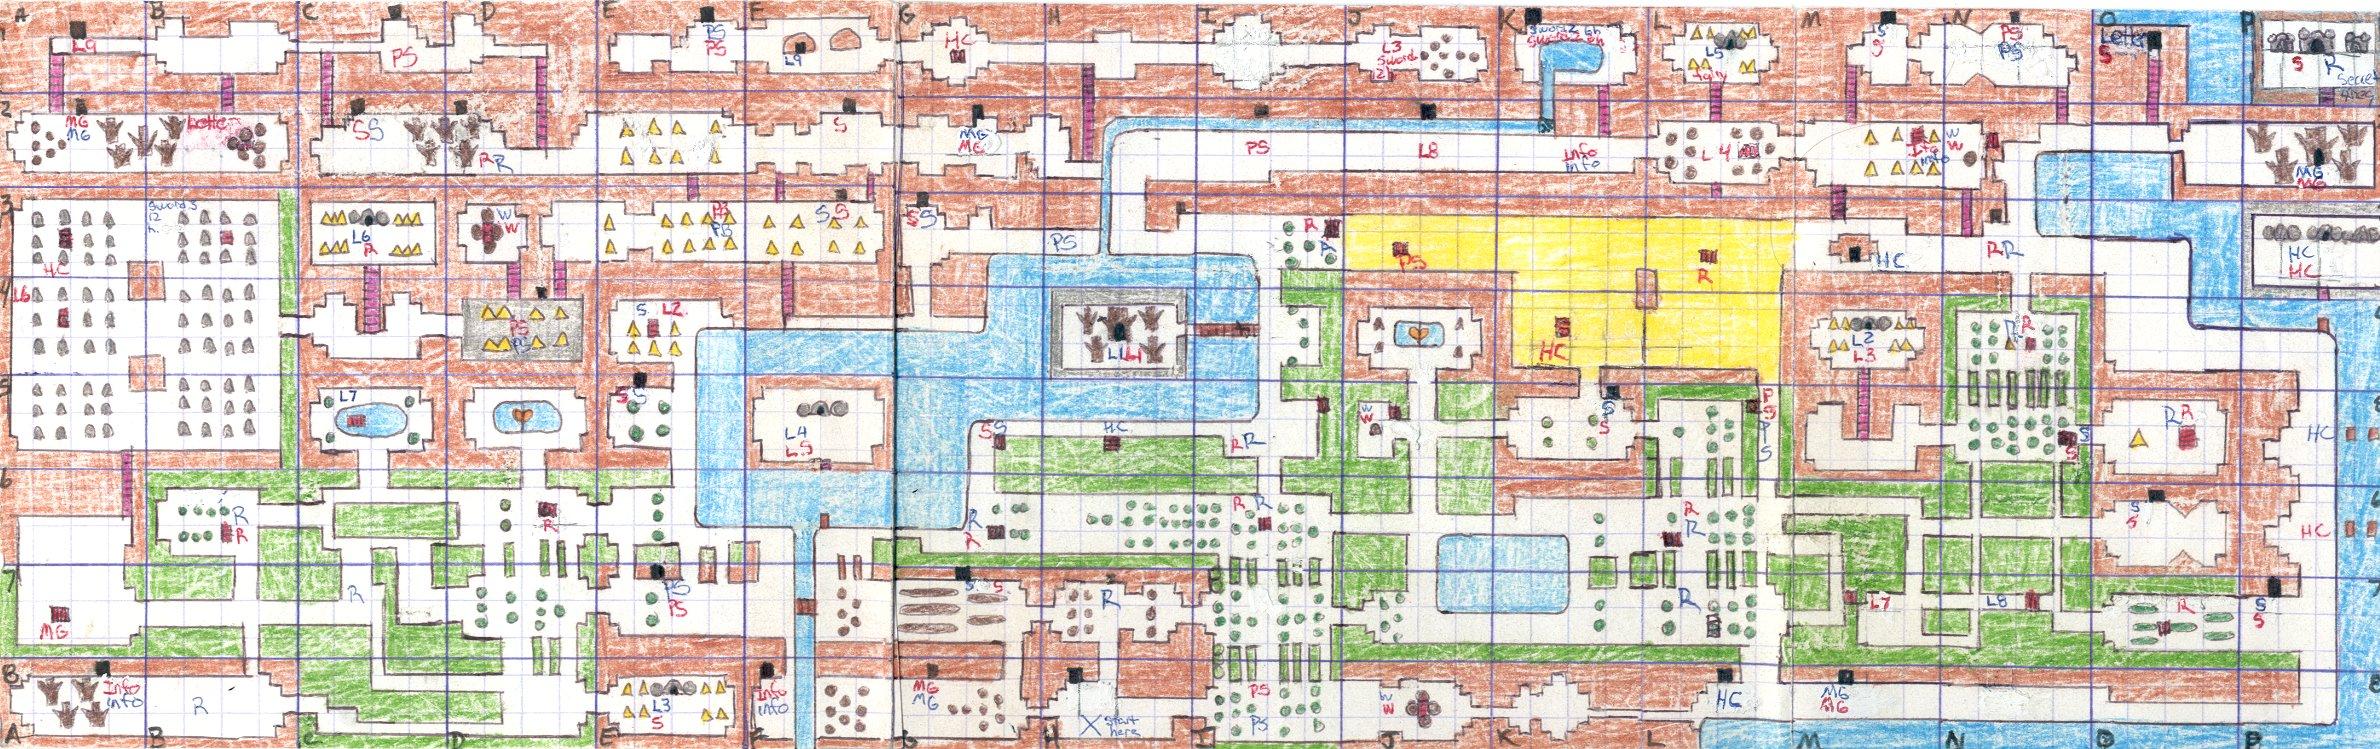 47+] Zelda Map Wallpaper on WallpaperSafari